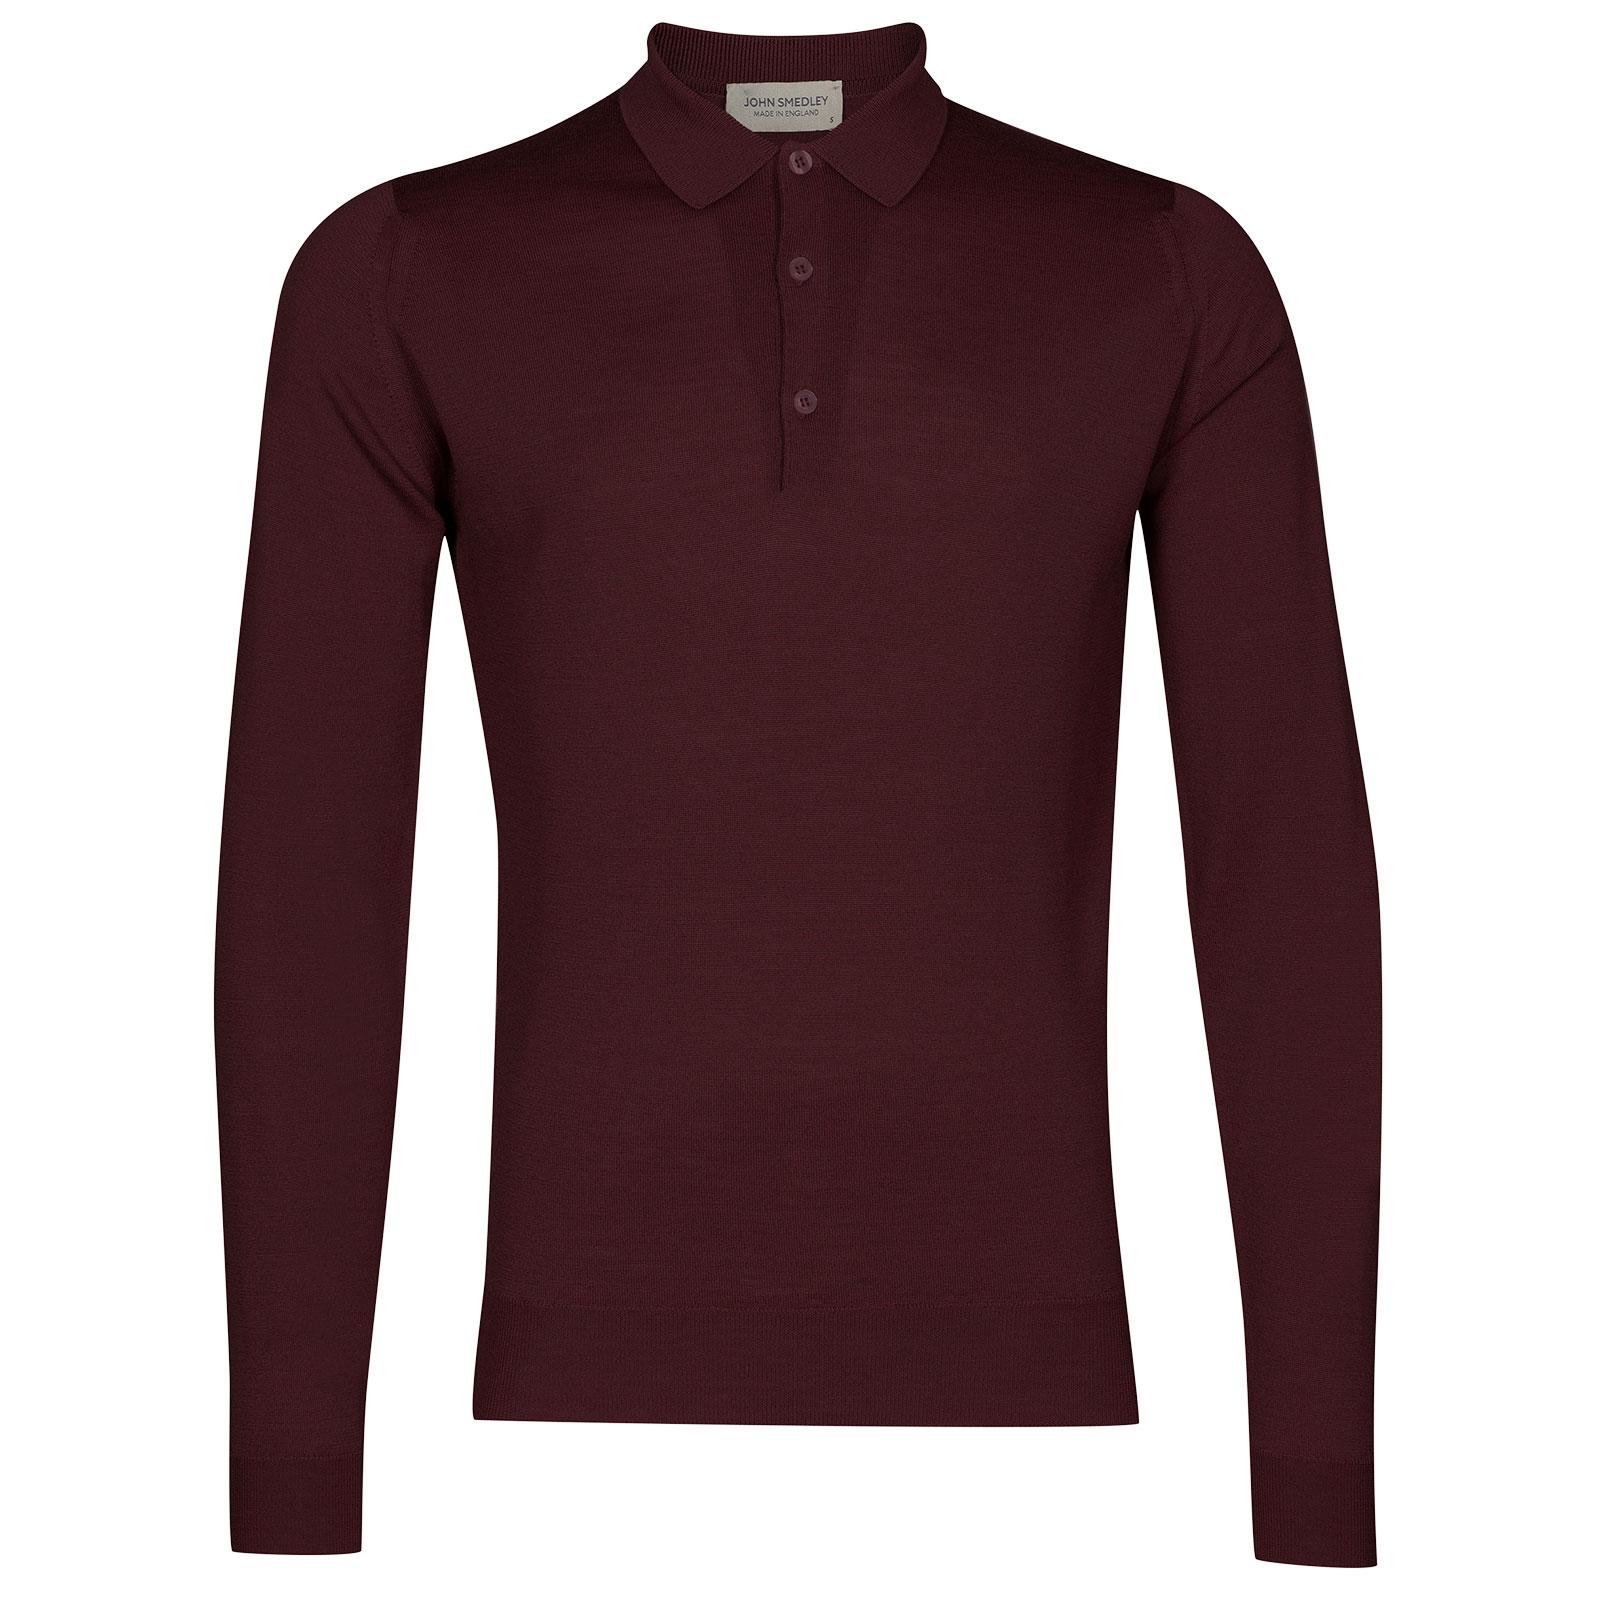 John Smedley belper Merino Wool Shirt in Maroon Blaze-XXL